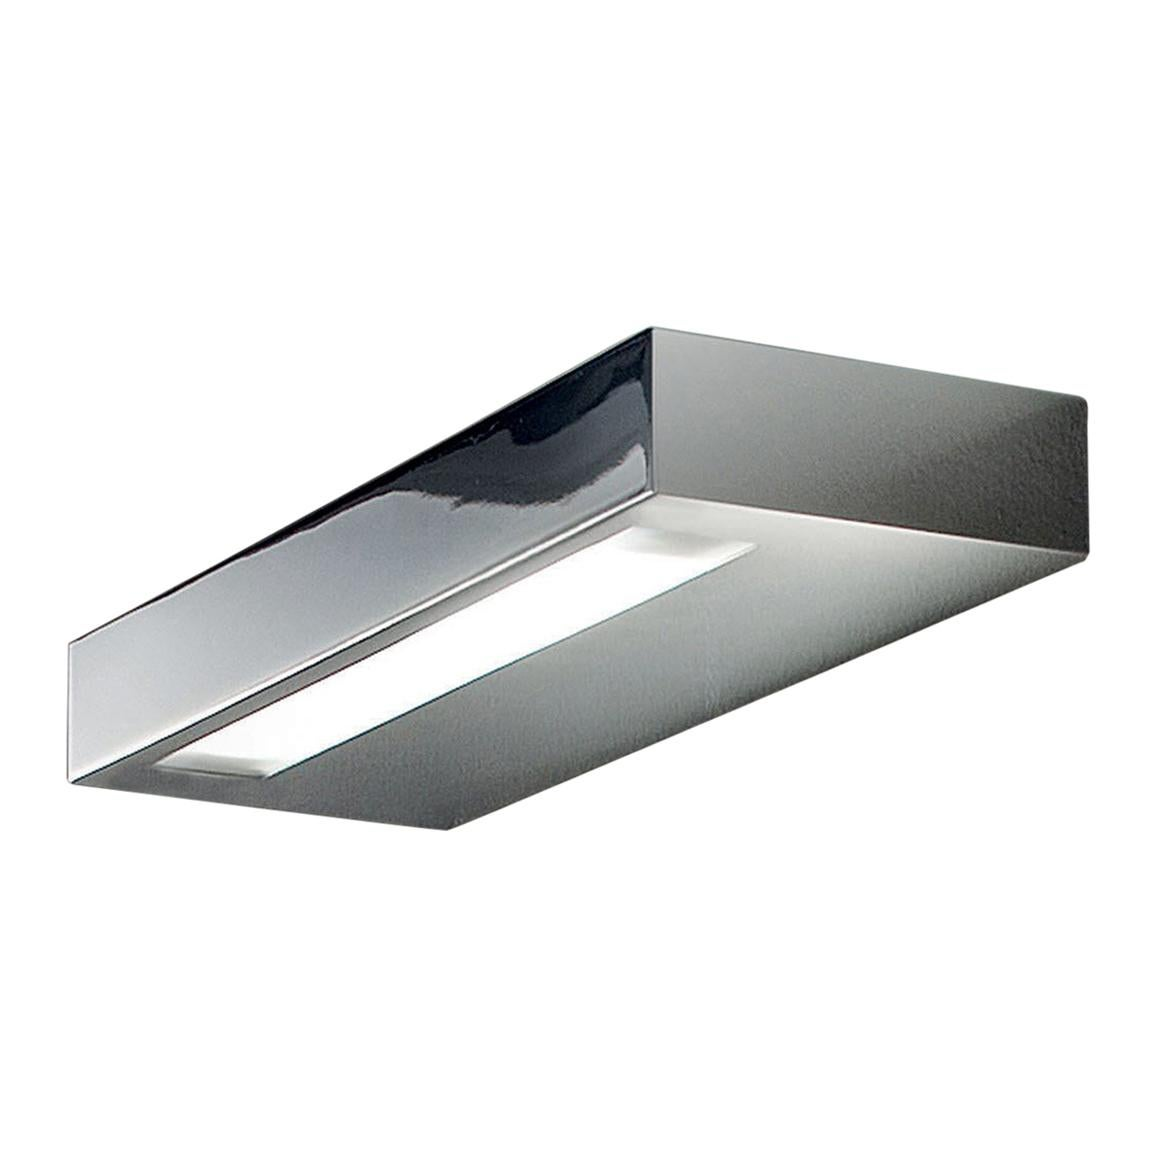 Leucos Alias P 35 LED Sconce in Chrome by Design Works Studio Tonetto & Lazzari